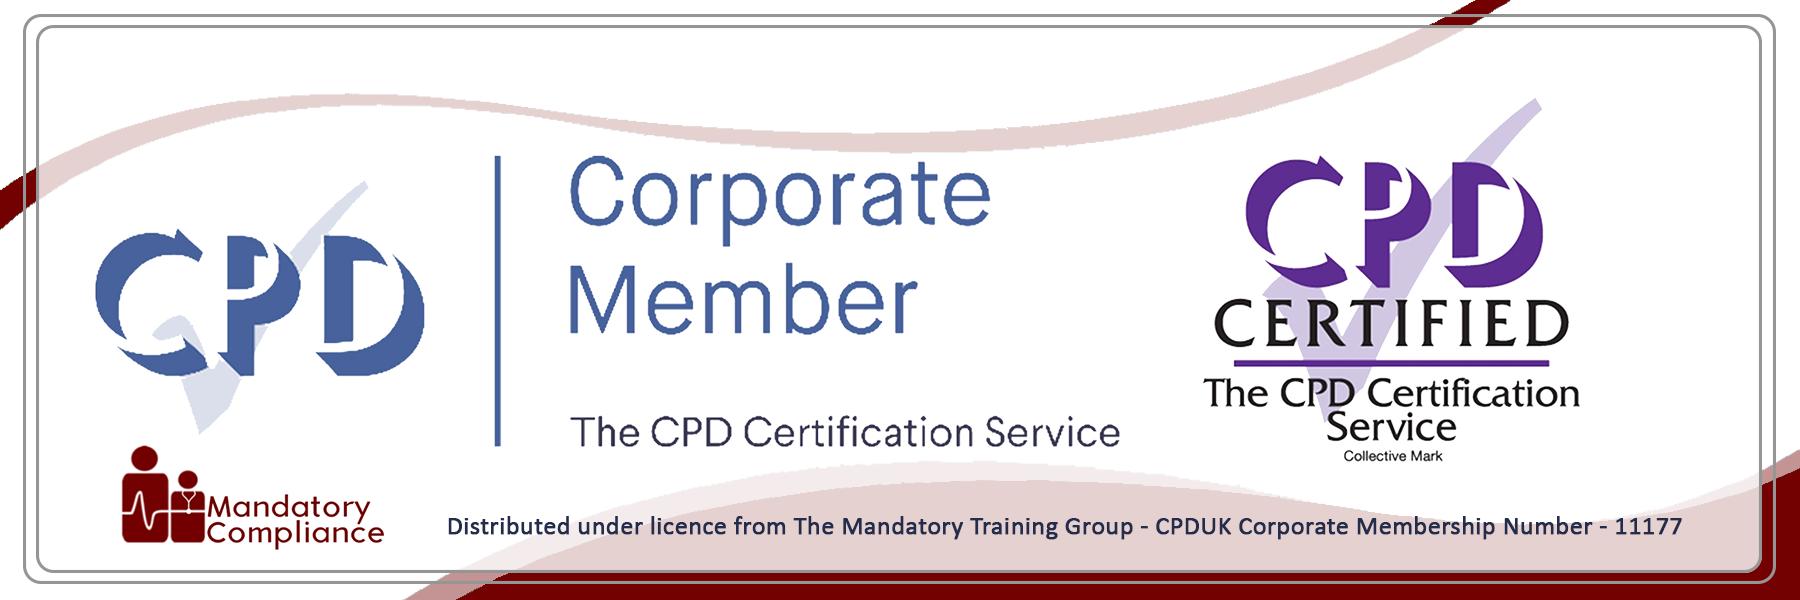 Candidate Mandatory Training Courses - Online Training Courses - CPDUK Accredited